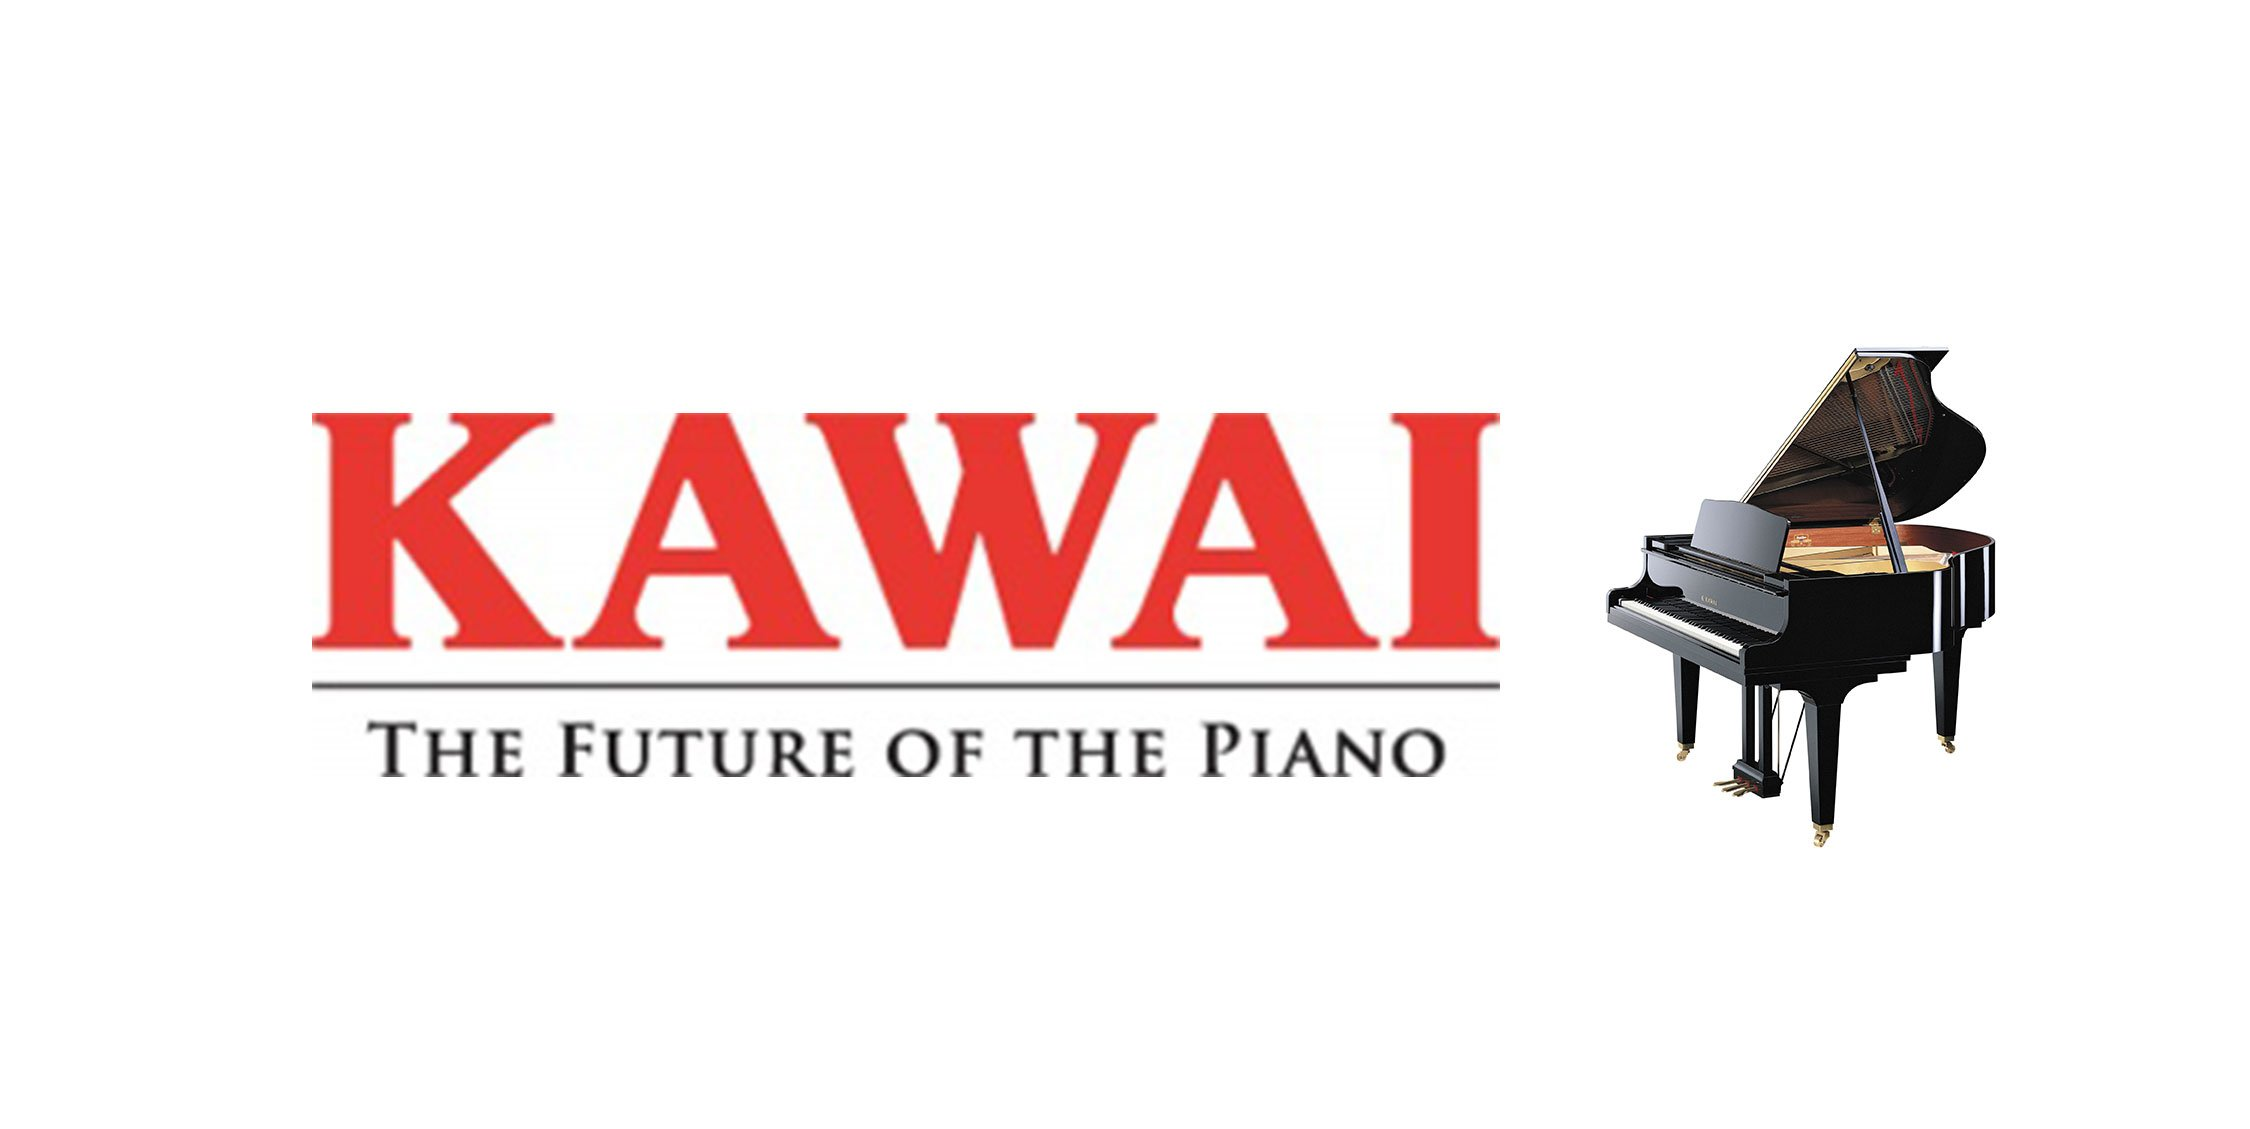 Kawai - The Future Of Pianos | England Piano